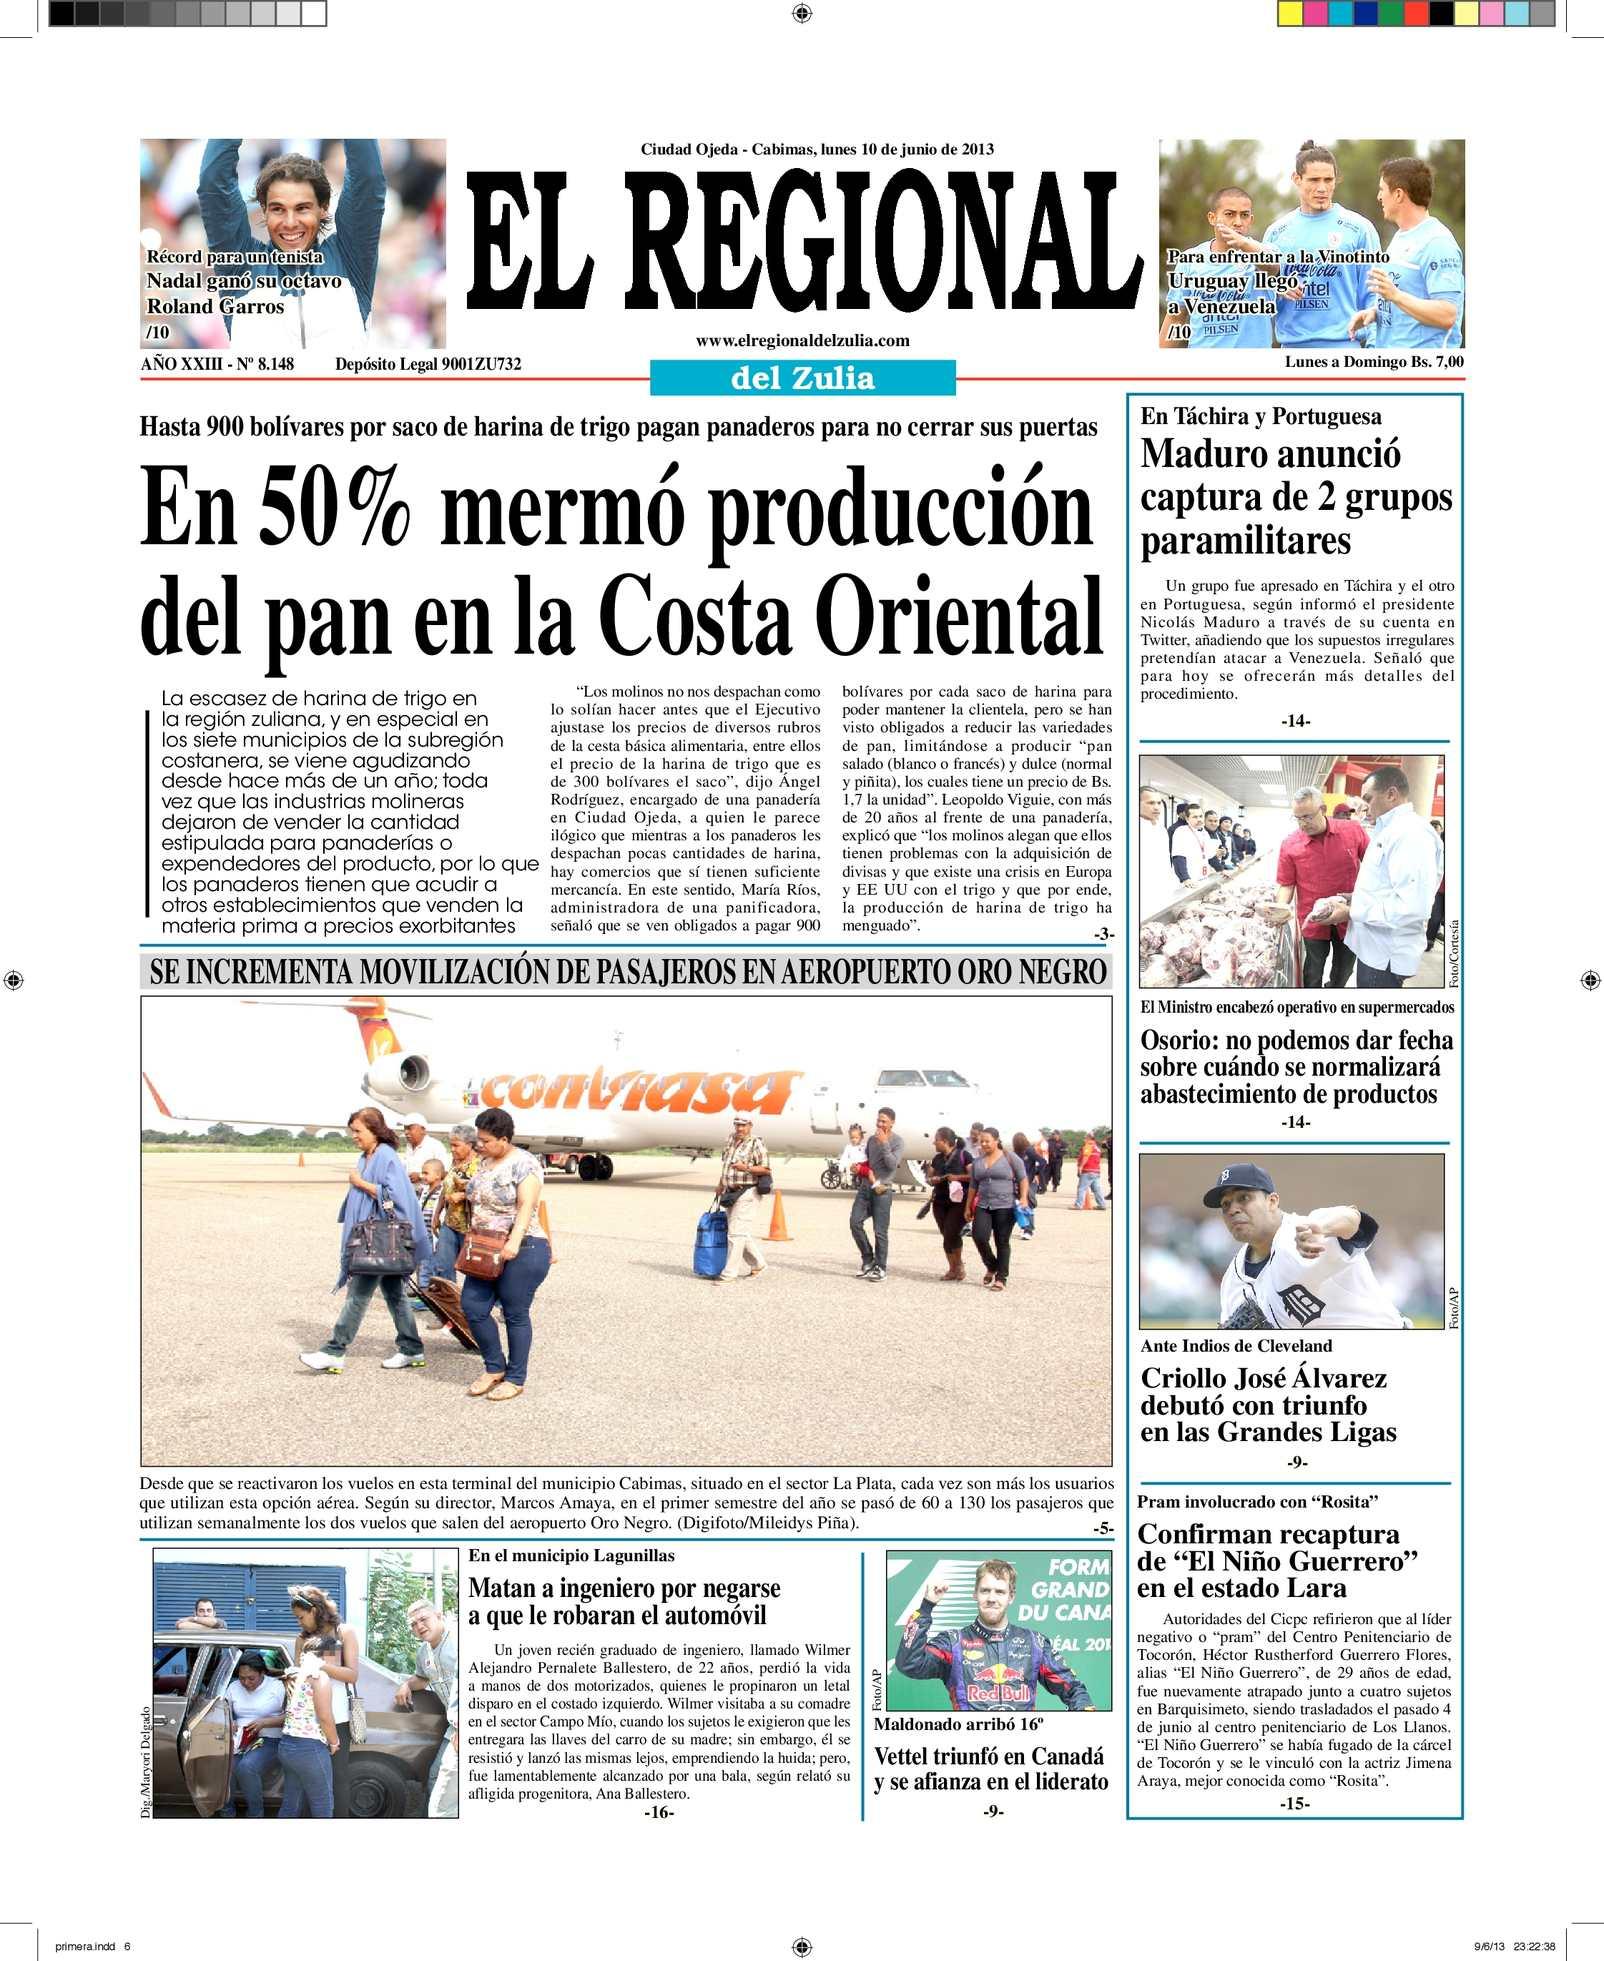 Calaméo - El Regional del Zulia 10-06-2013